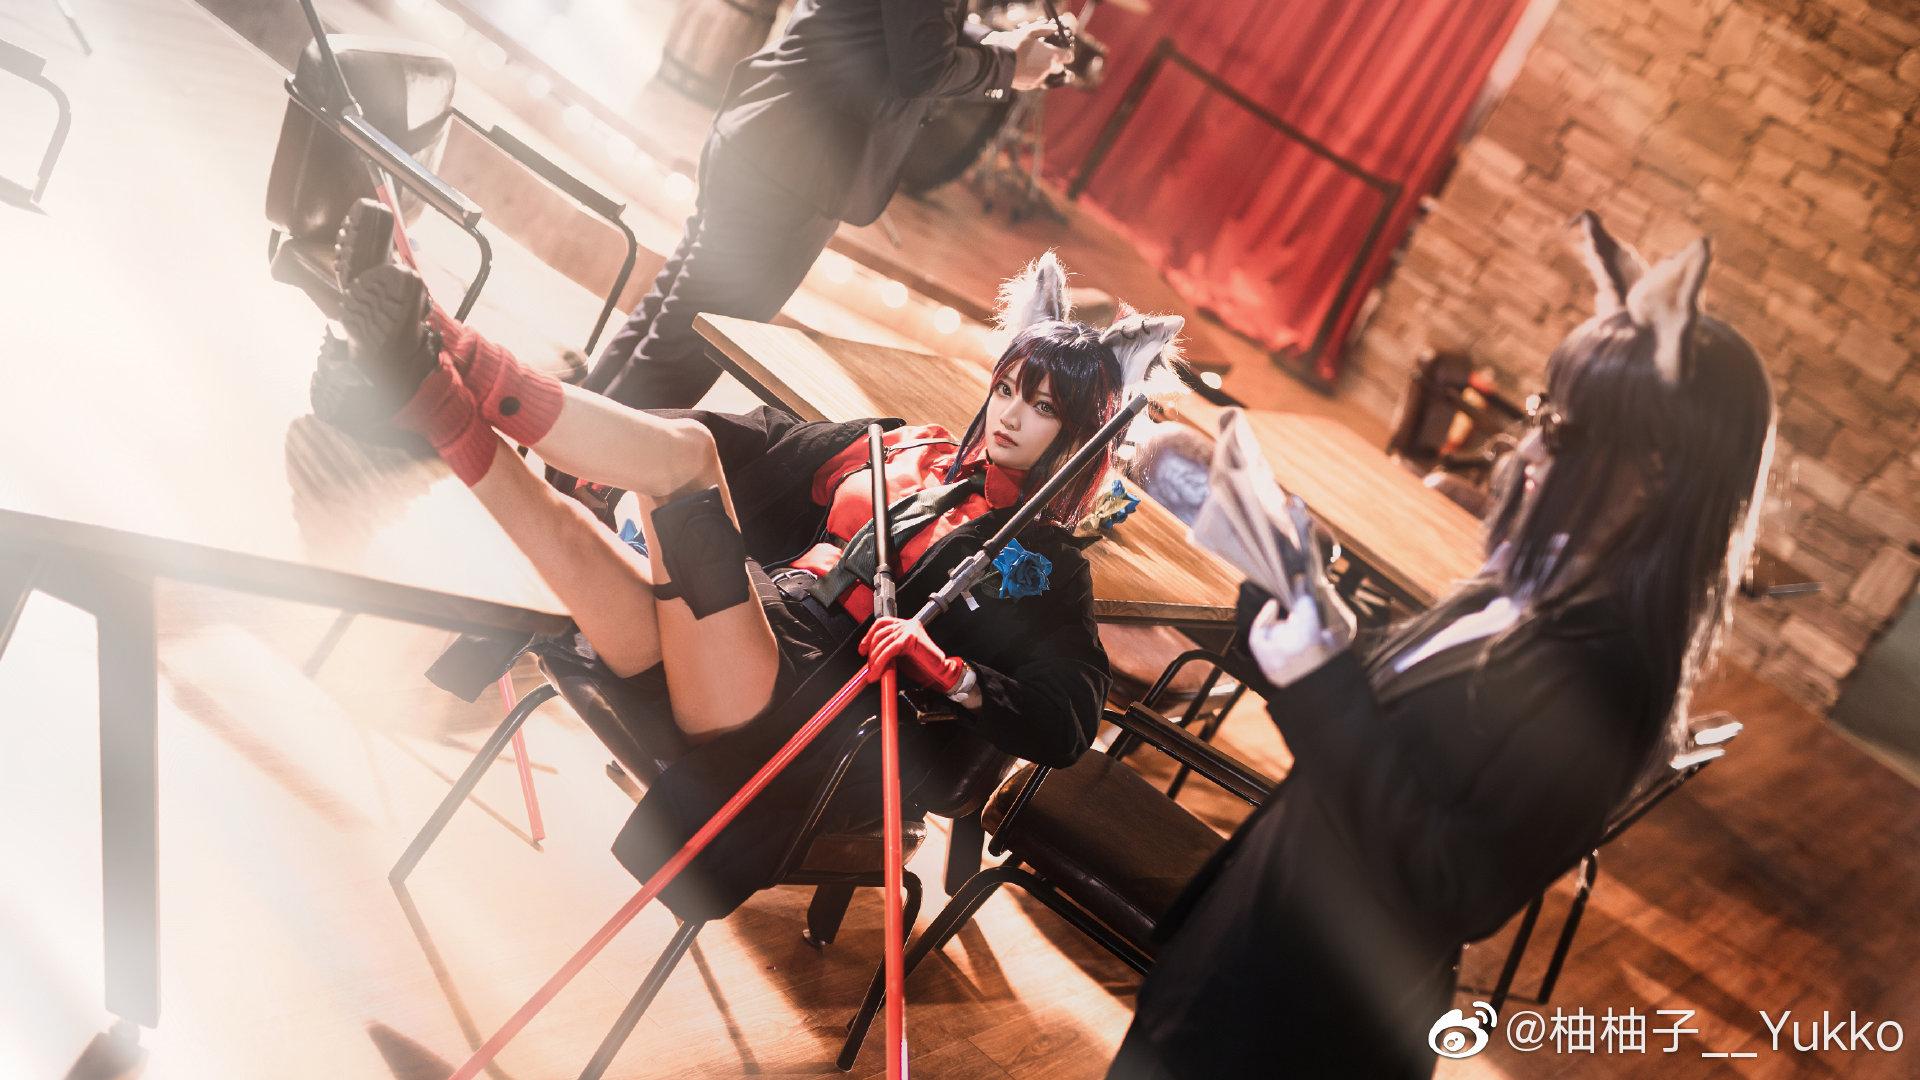 [COS]明日方舟   德克萨斯   @柚柚子__Yukko (9P) -cosplay男生图片超帅插图